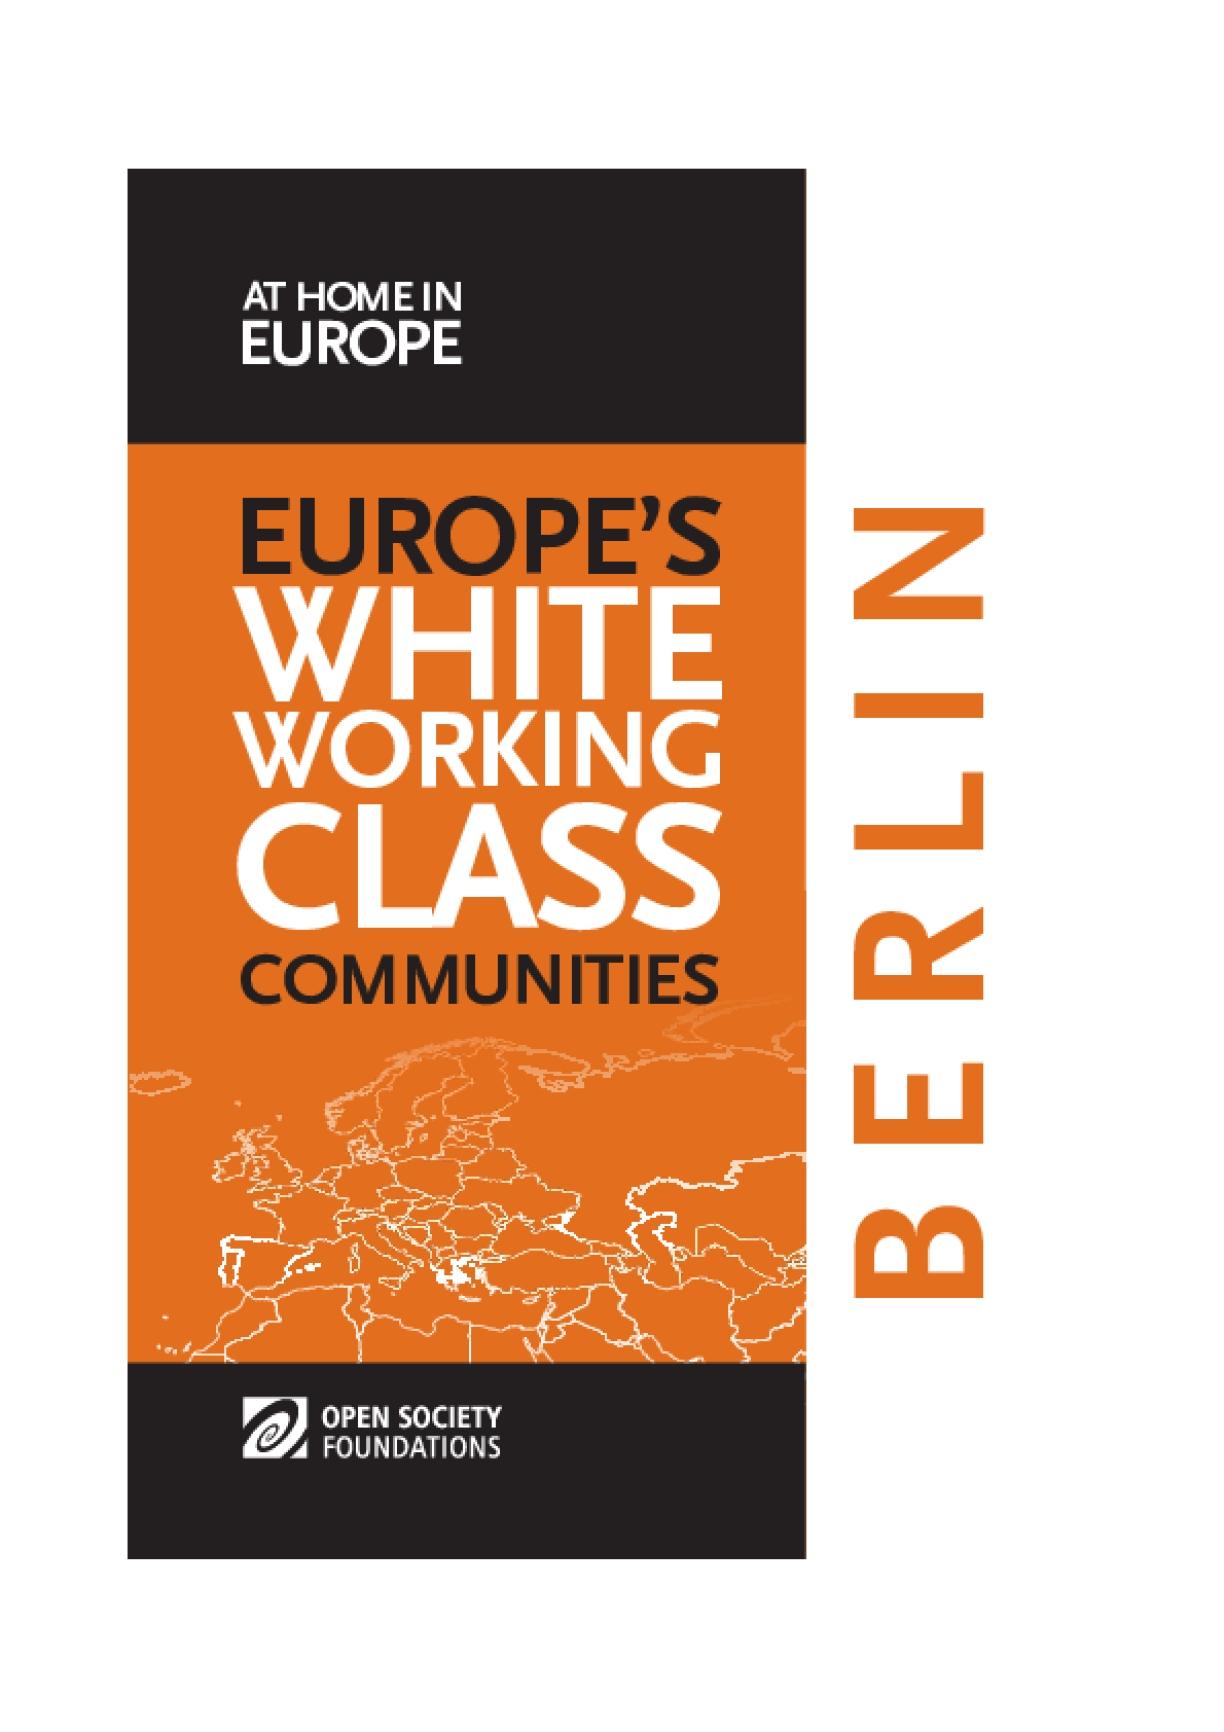 White Working Class Communities in Berlin